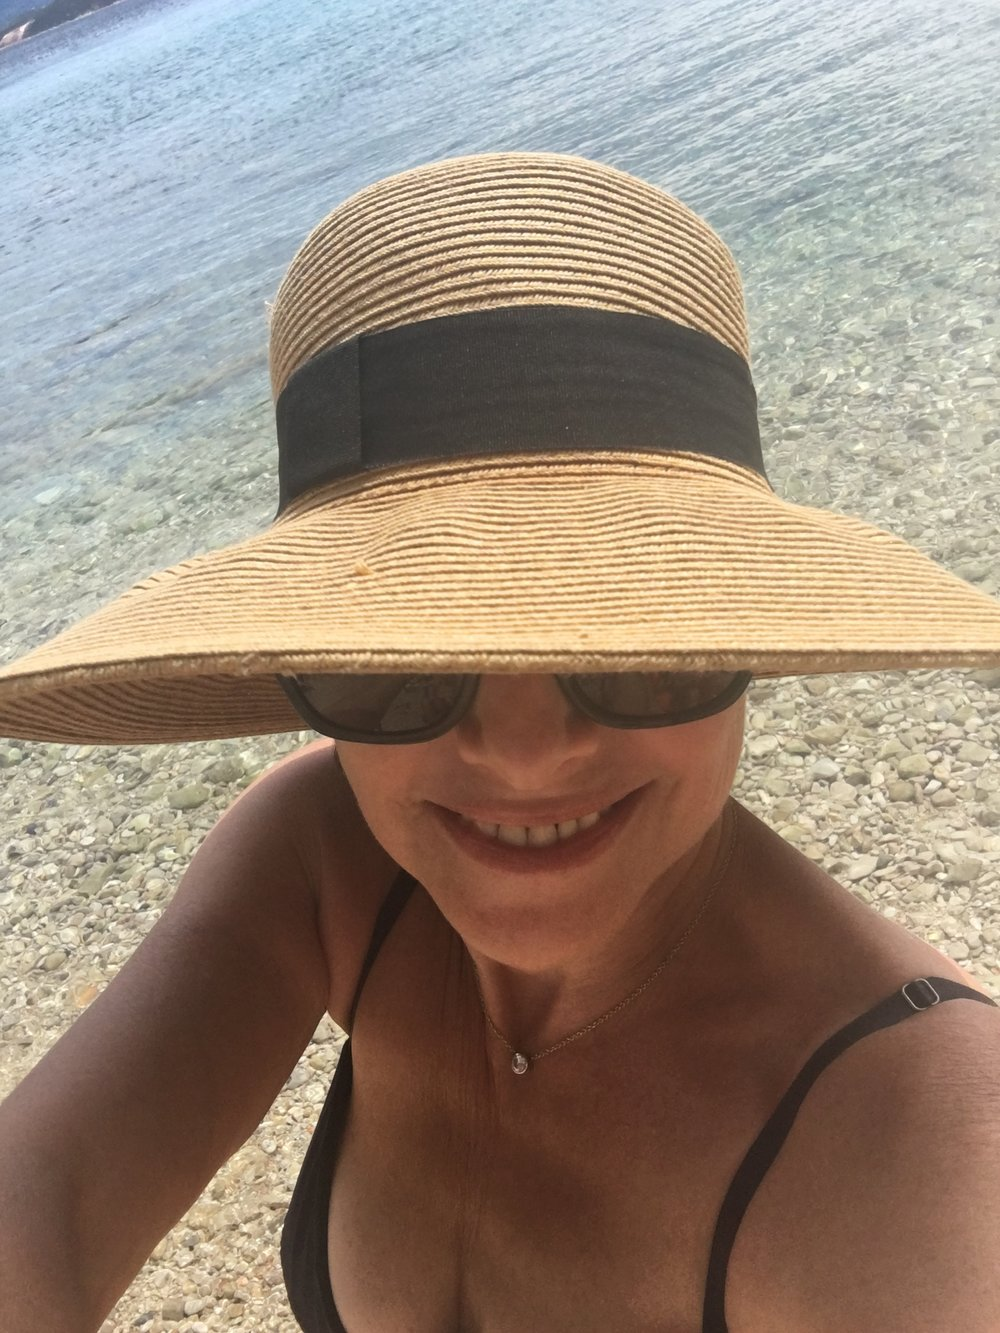 selfie iN the town of Bol, Croatia